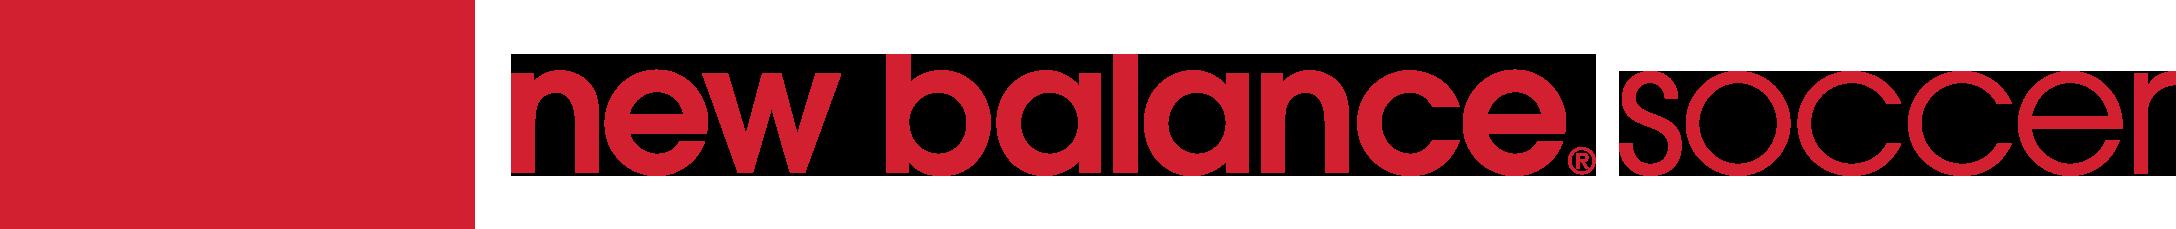 New Balance Soccer - New Balance Logo PNG